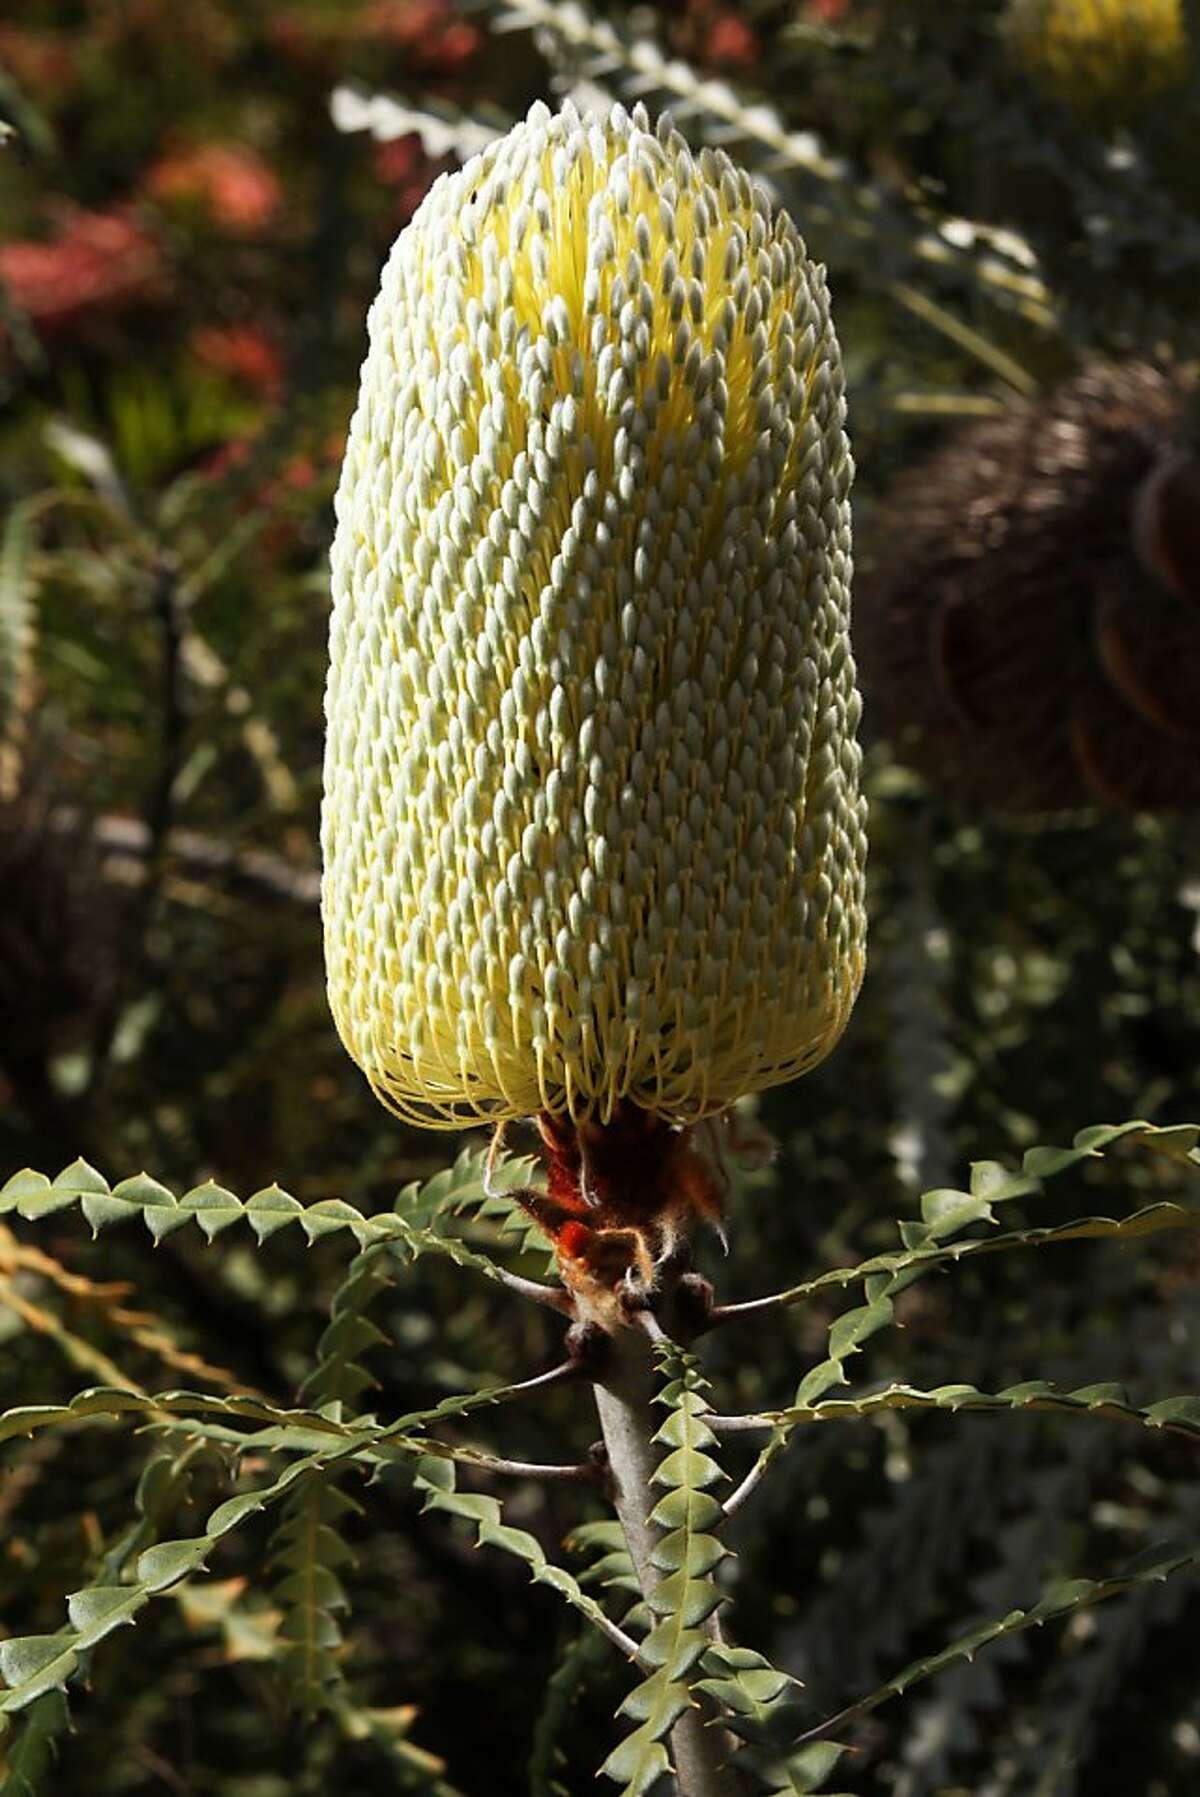 A flowering Banksia speciosa plants blooms in the South African garden at UC Santa Cruz Arboretum, Tuesday, May 14, 2013 in Santa Cruz, Calif.